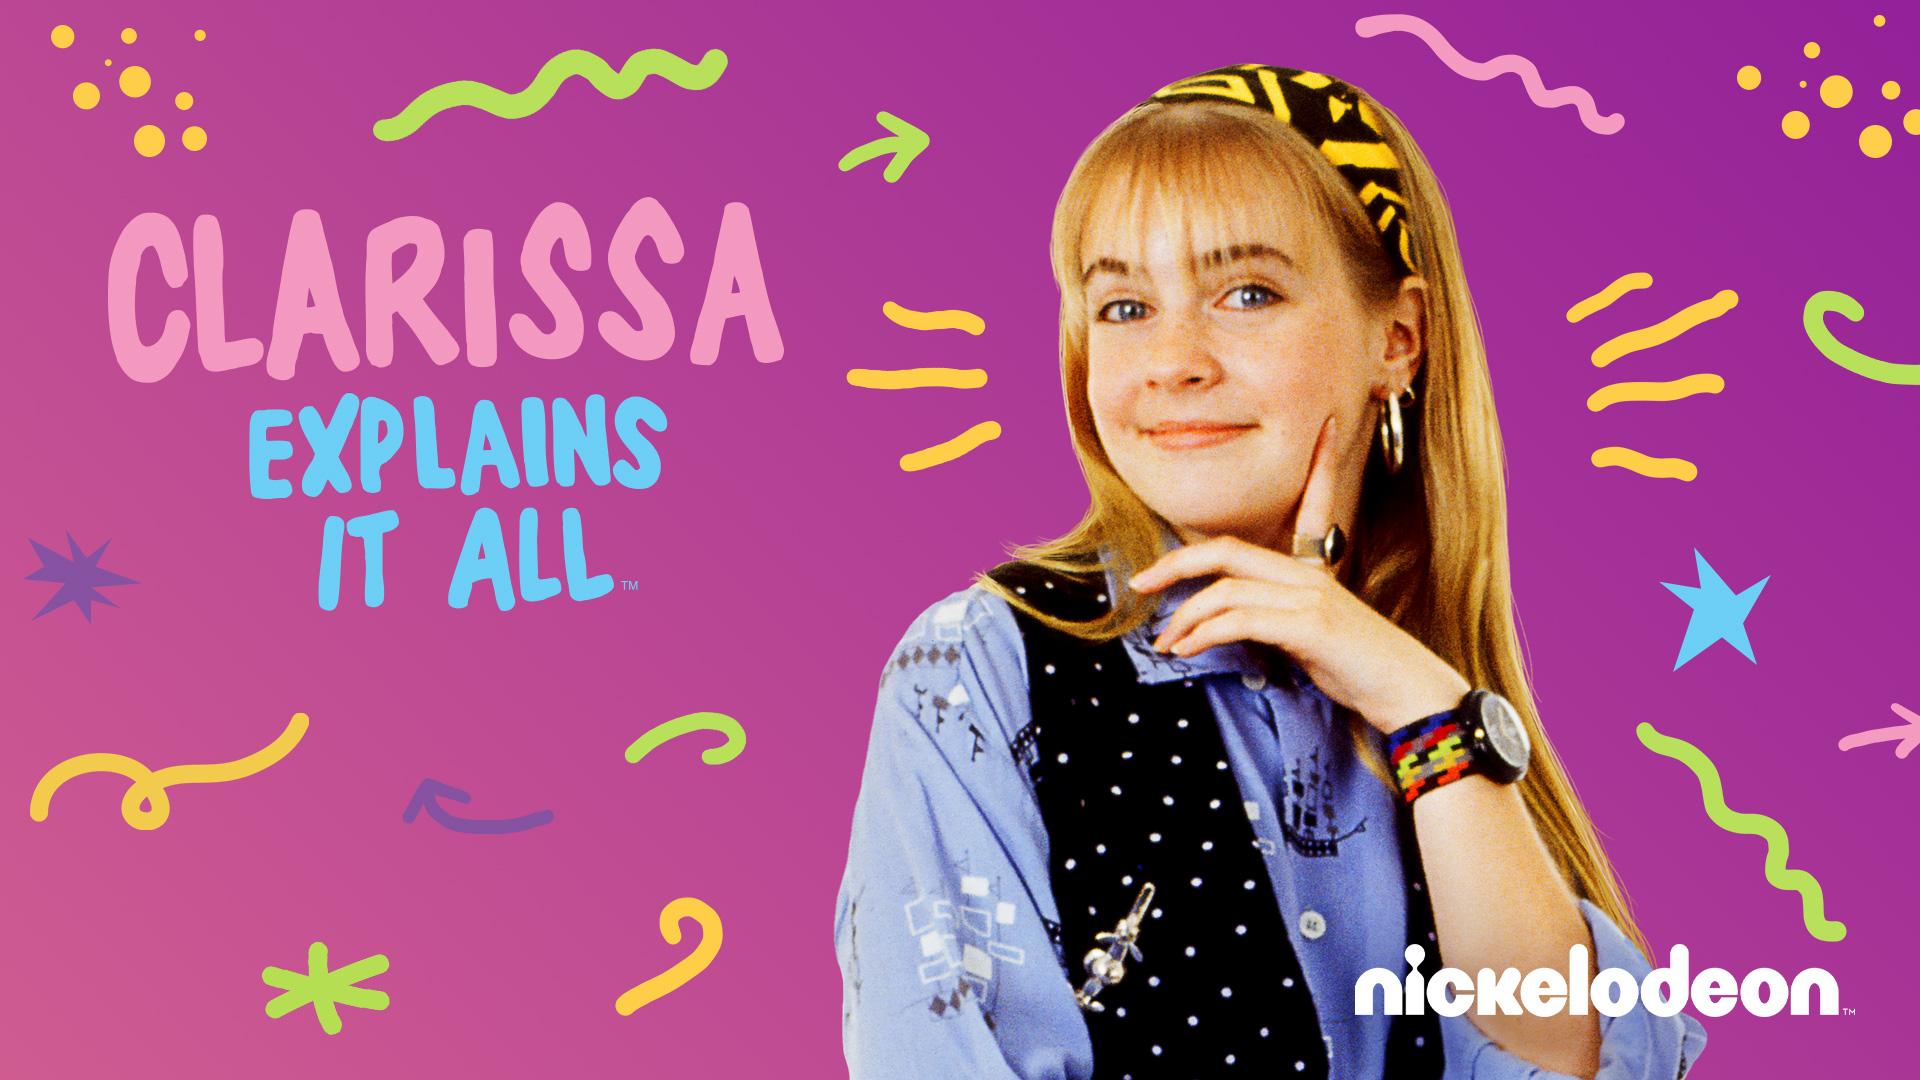 Clarissa Explains It All Season 1